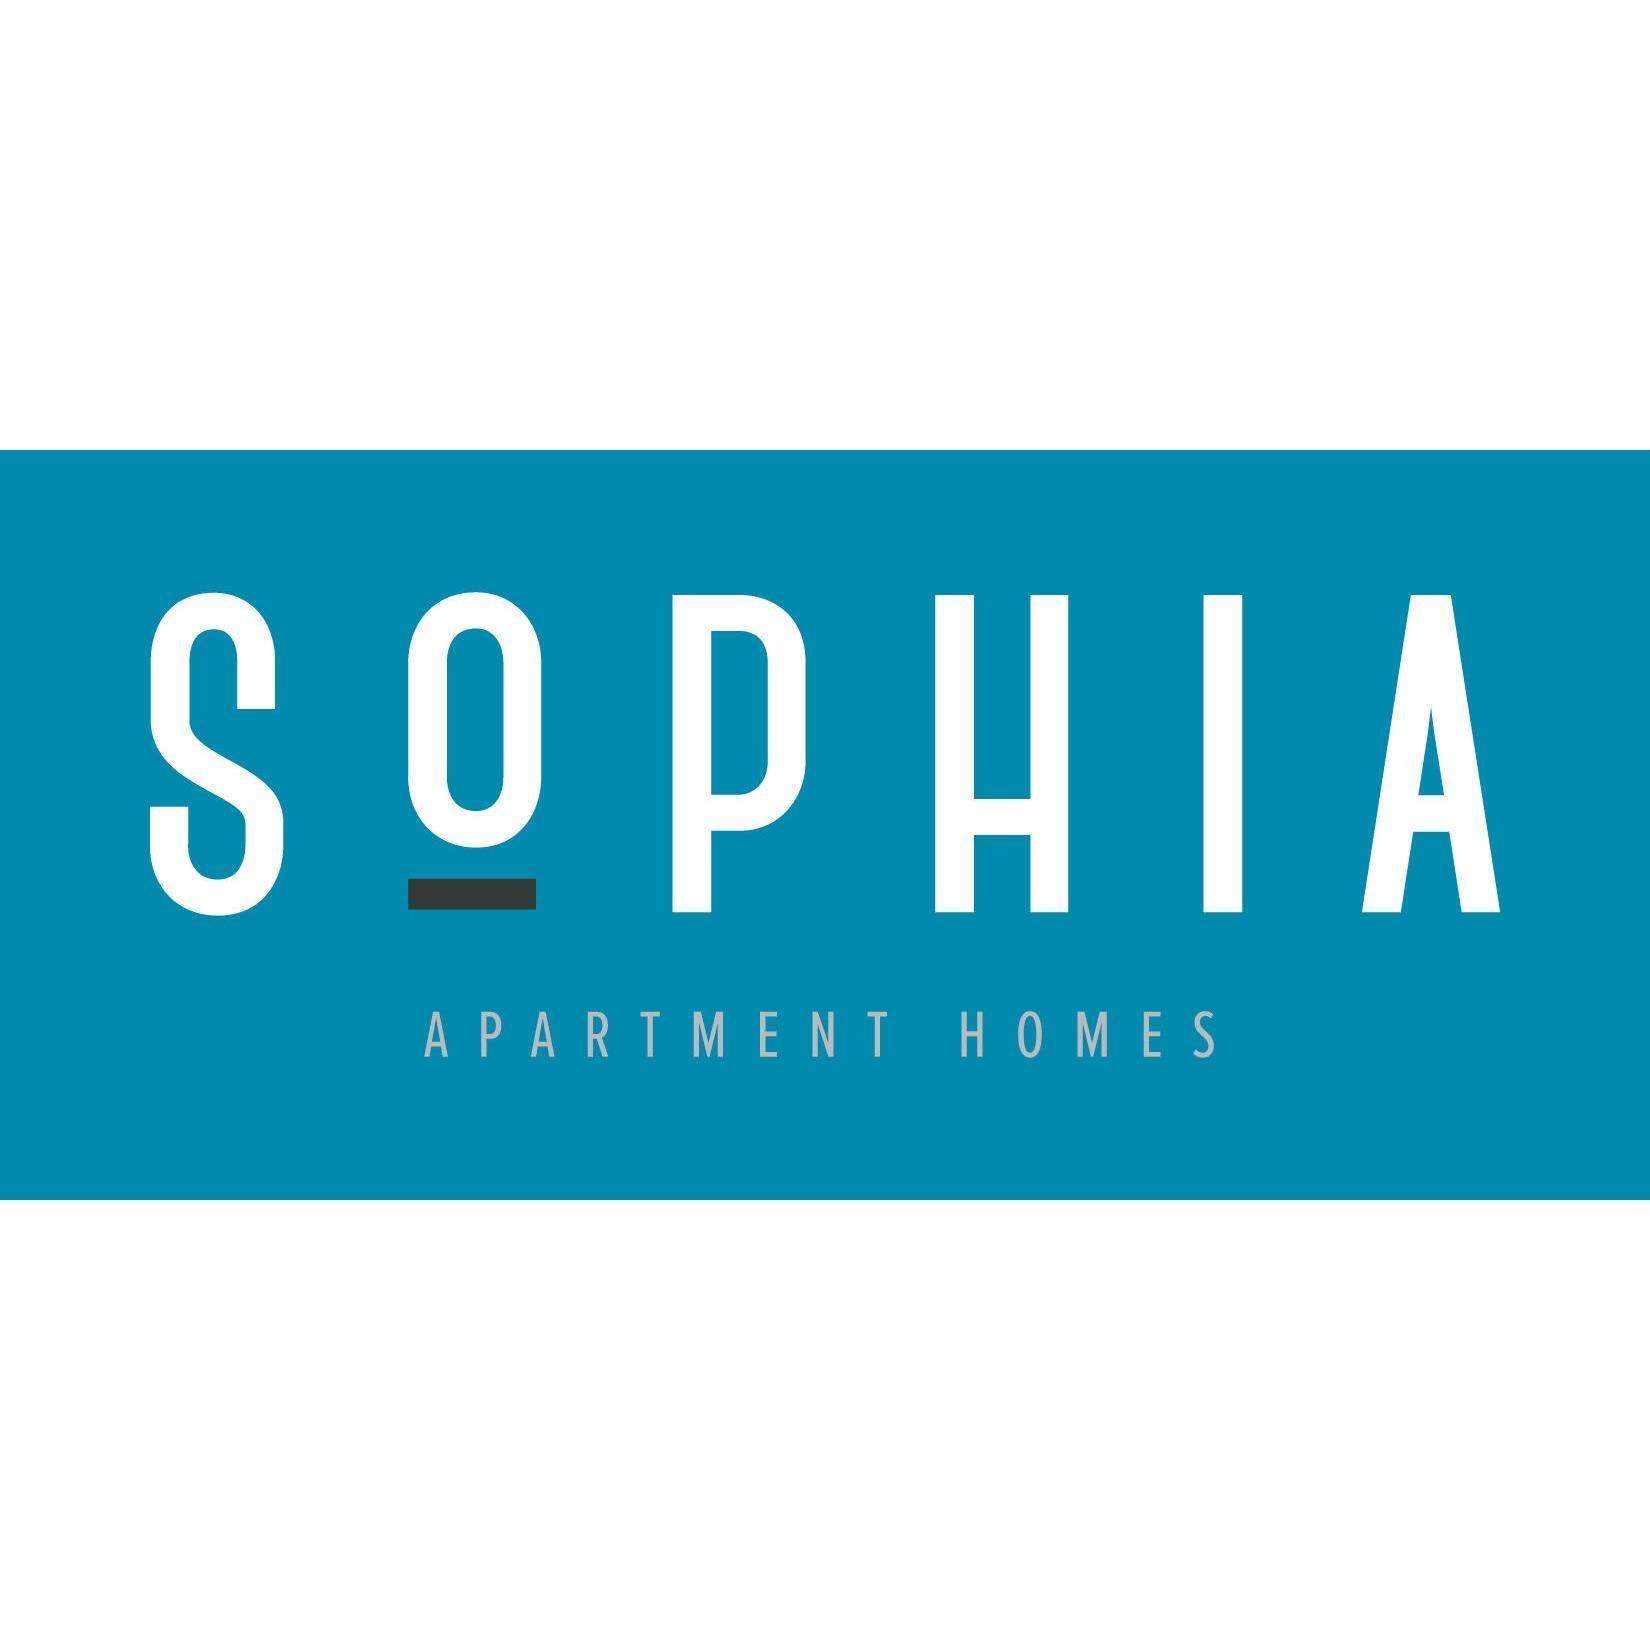 The Sophia Apartments